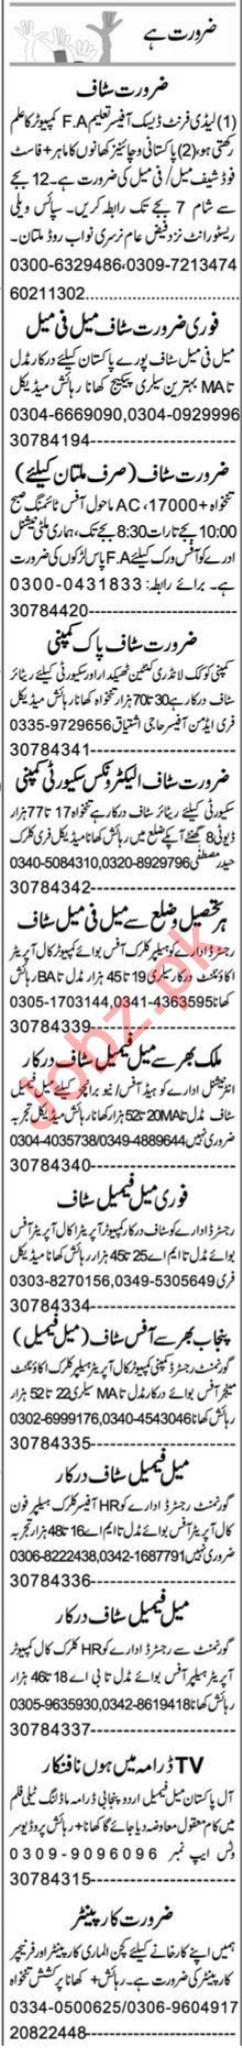 Express Sunday Multan Classified Ads 19 Sep 2021